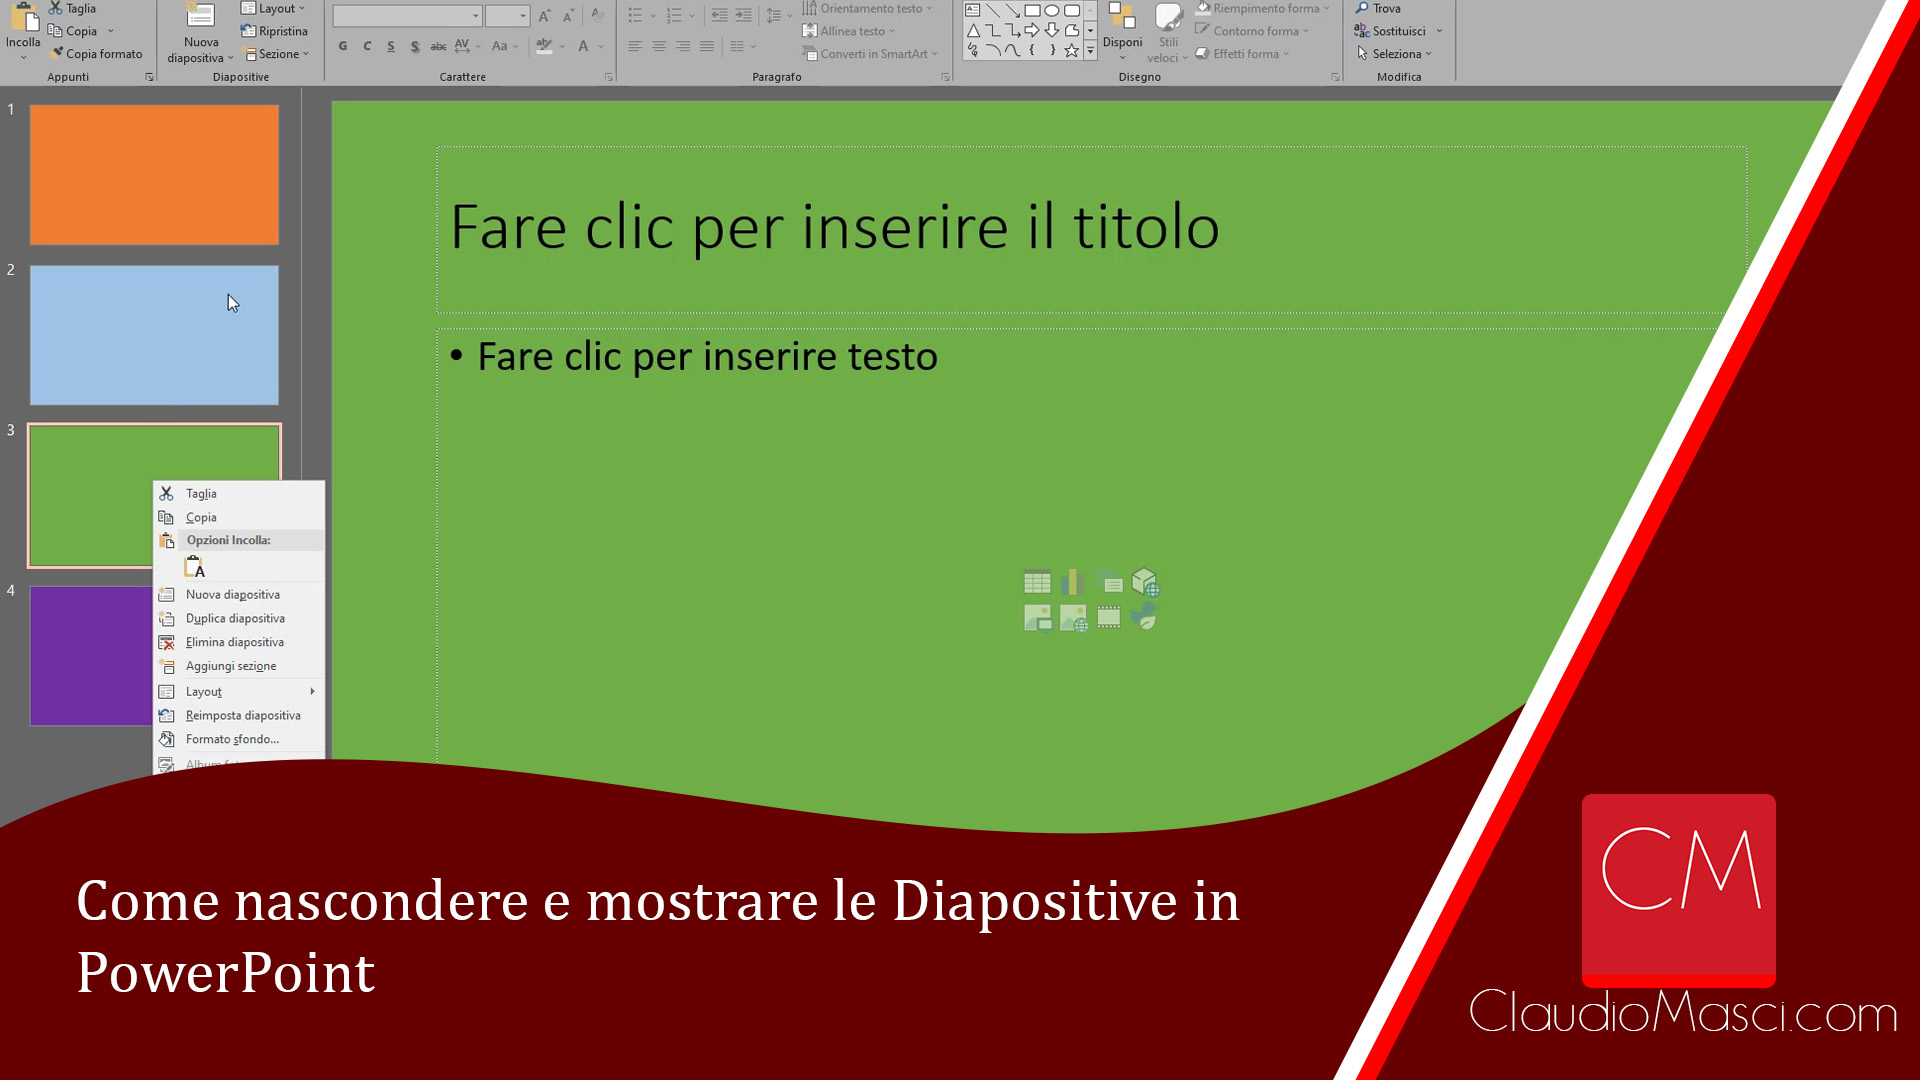 Come nascondere e mostrare le Diapositive in PowerPoint